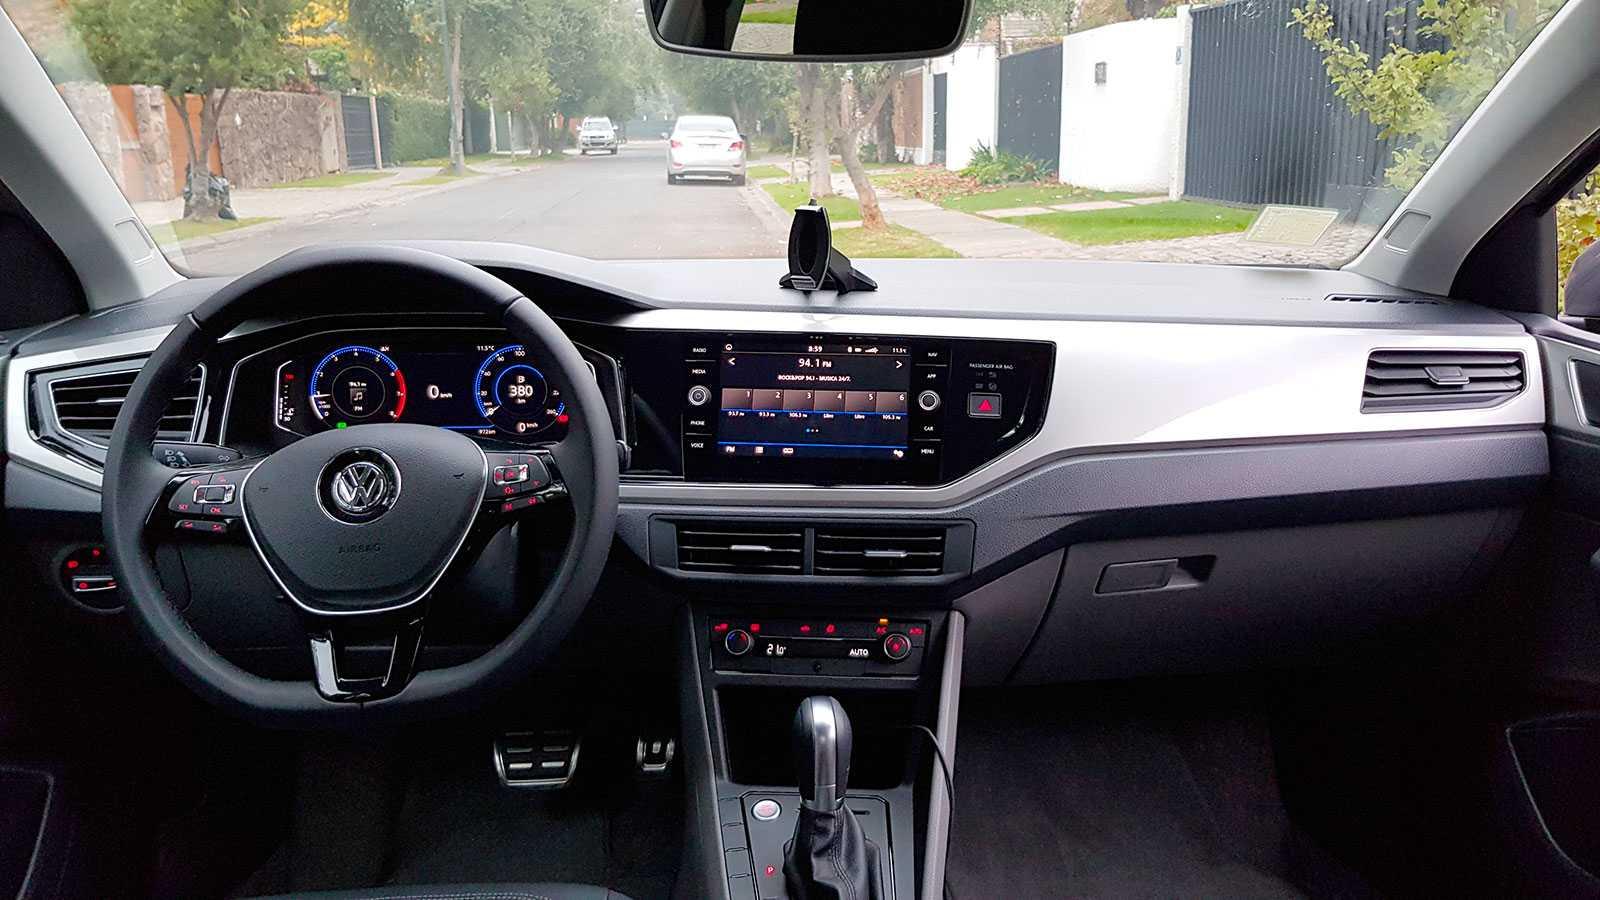 Vw Virtus 2019 Mexico 2019 2020 Gm Car Models